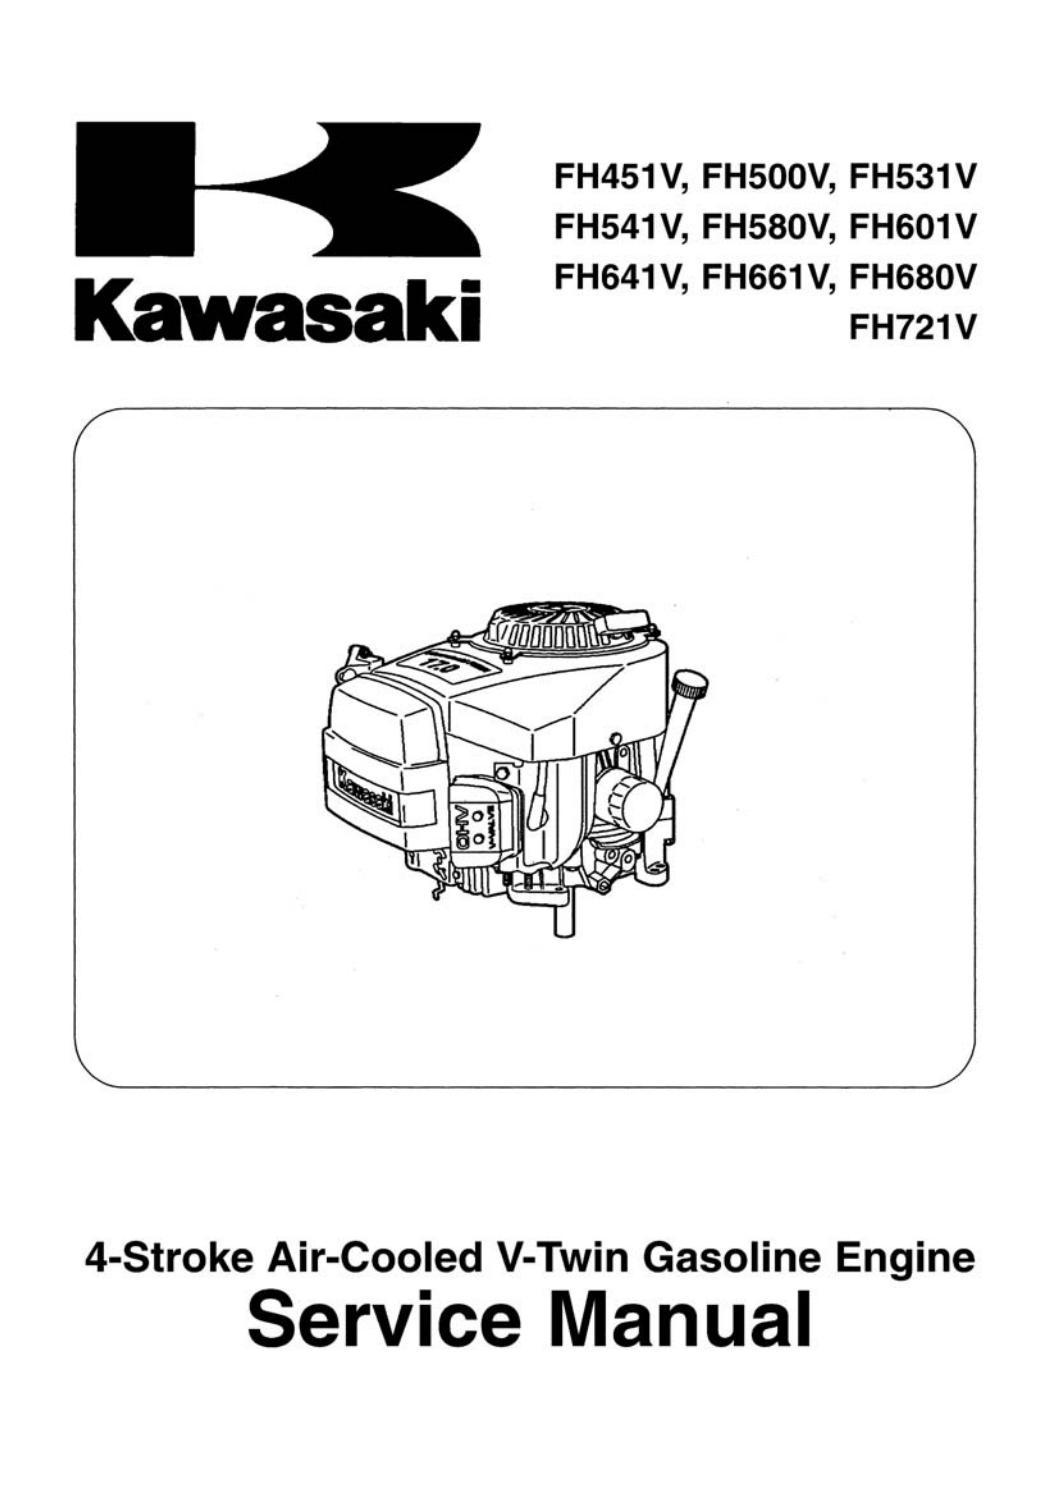 Kawasaki Fh541v 4 Stroke Air Cooled V Twin Gasoline Engine Service Repair Manual By Ucfn6p6 Issuu